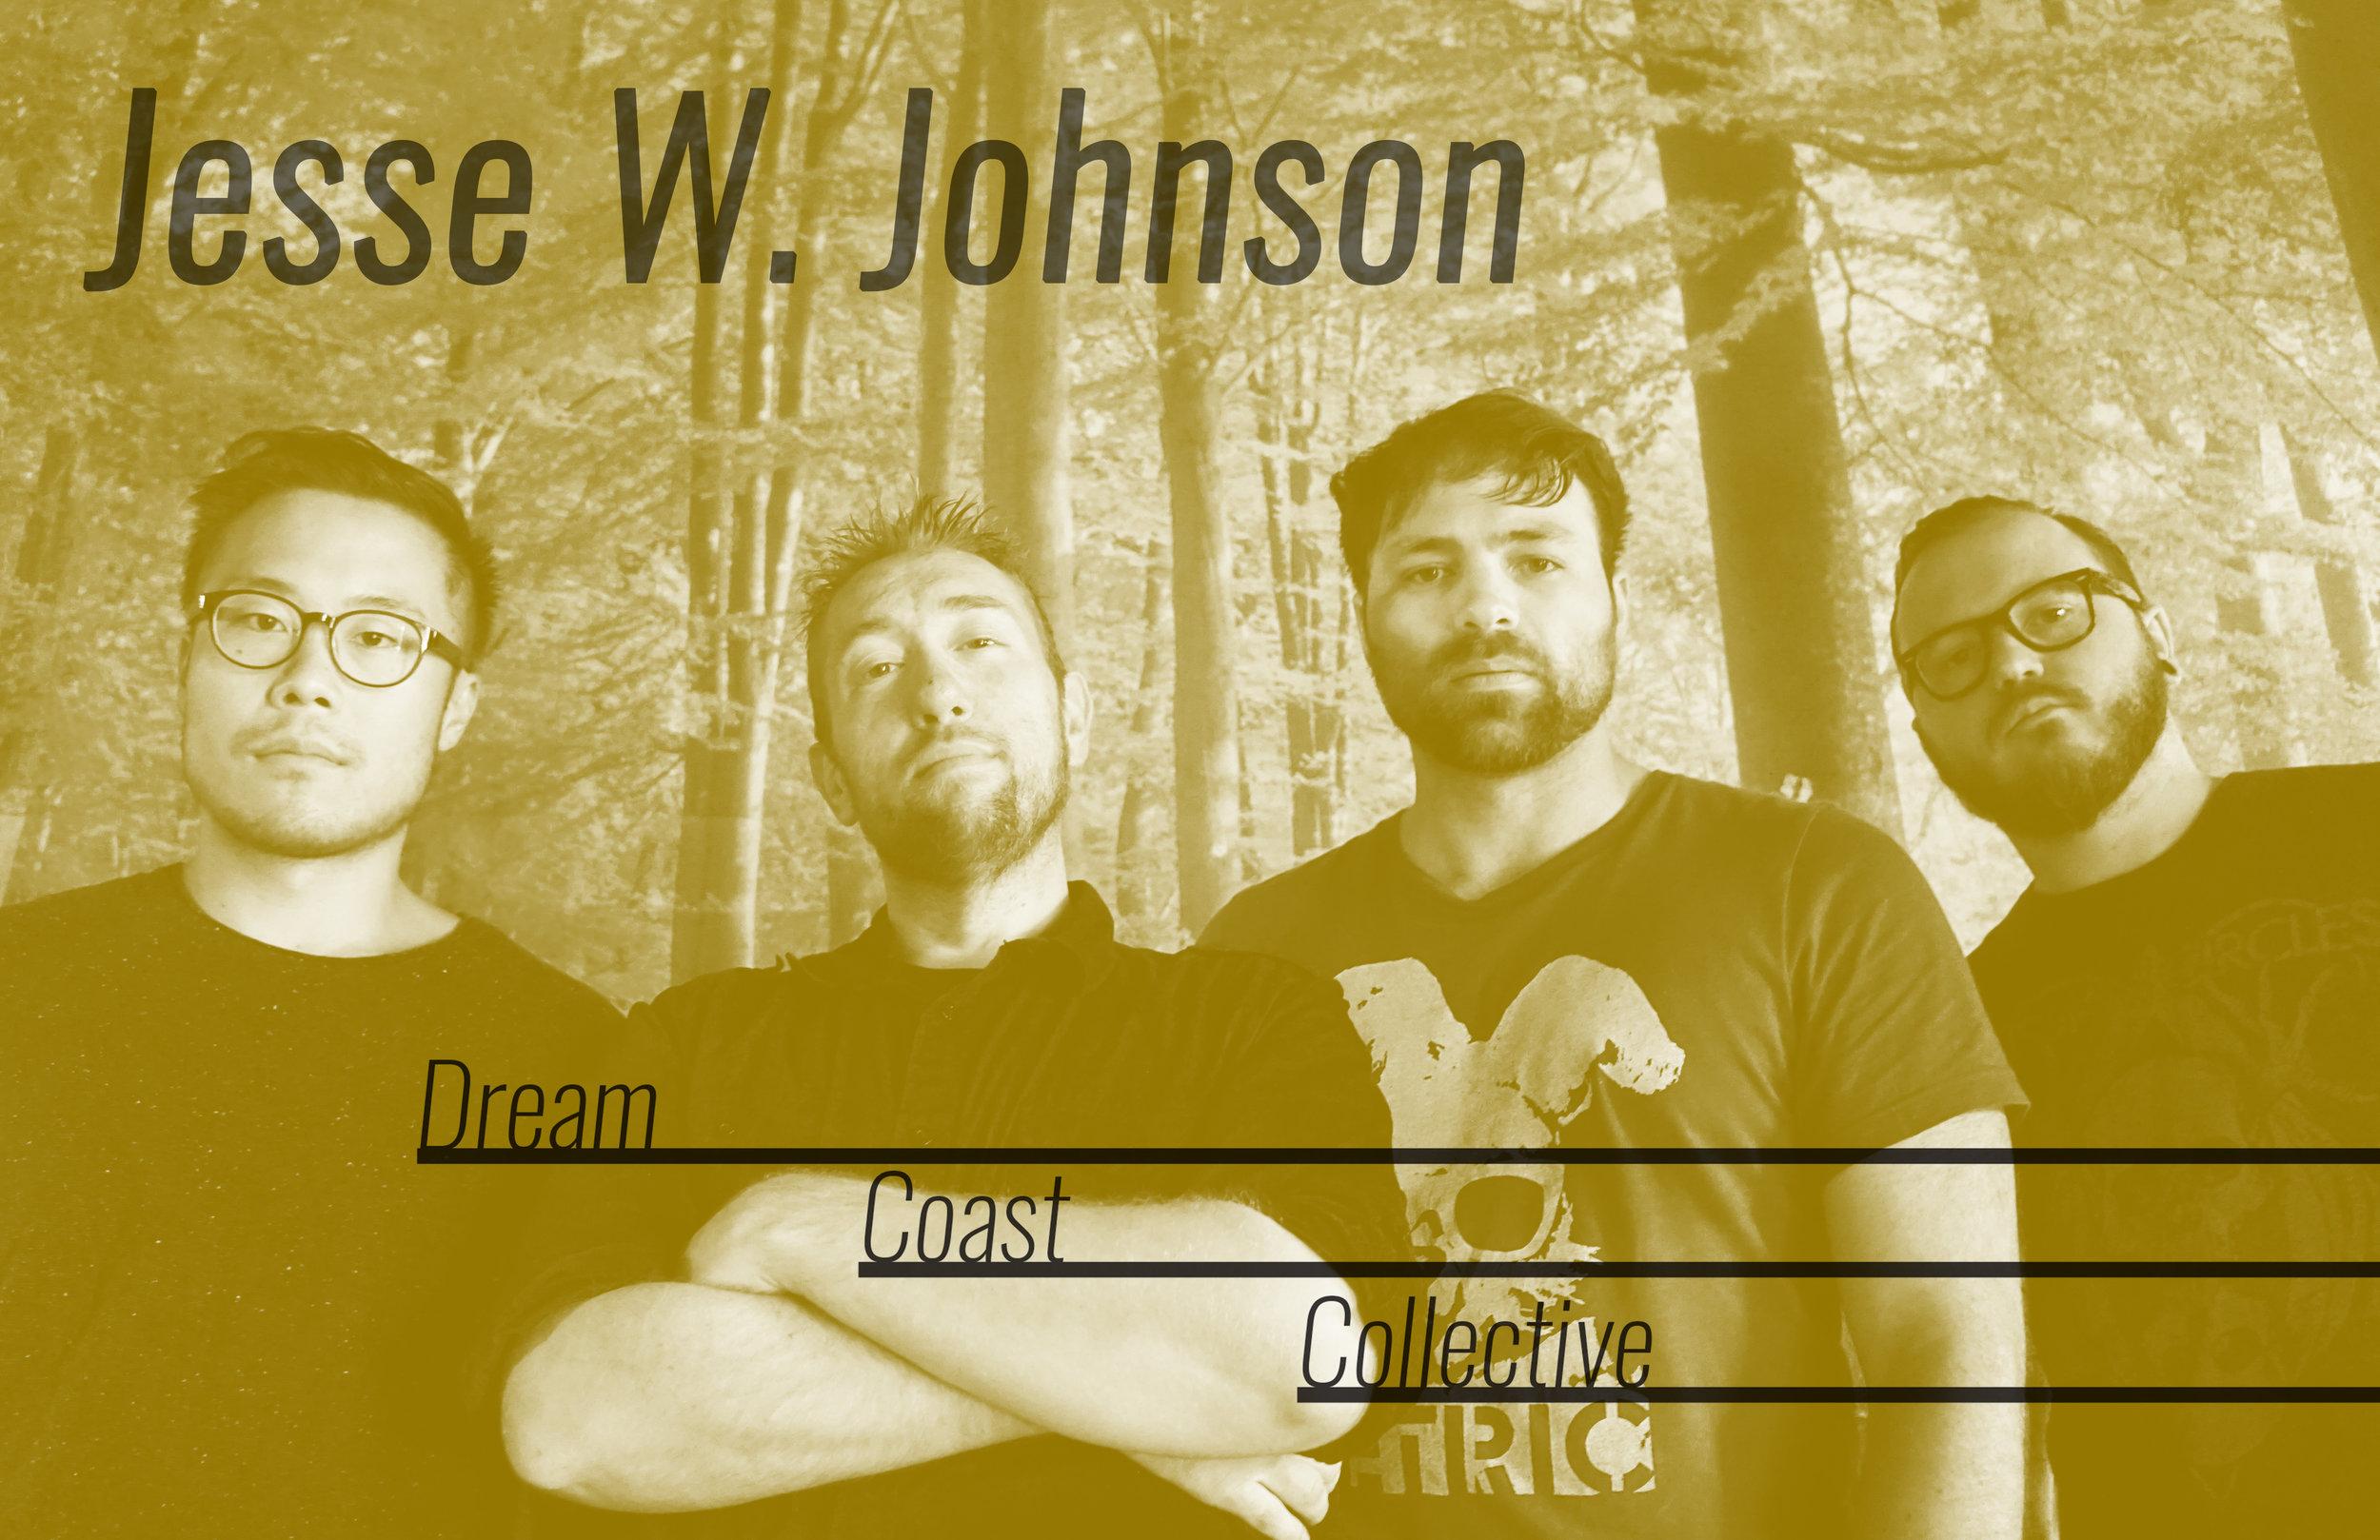 Dream Coast Band - Jesse W. Johnson.jpg